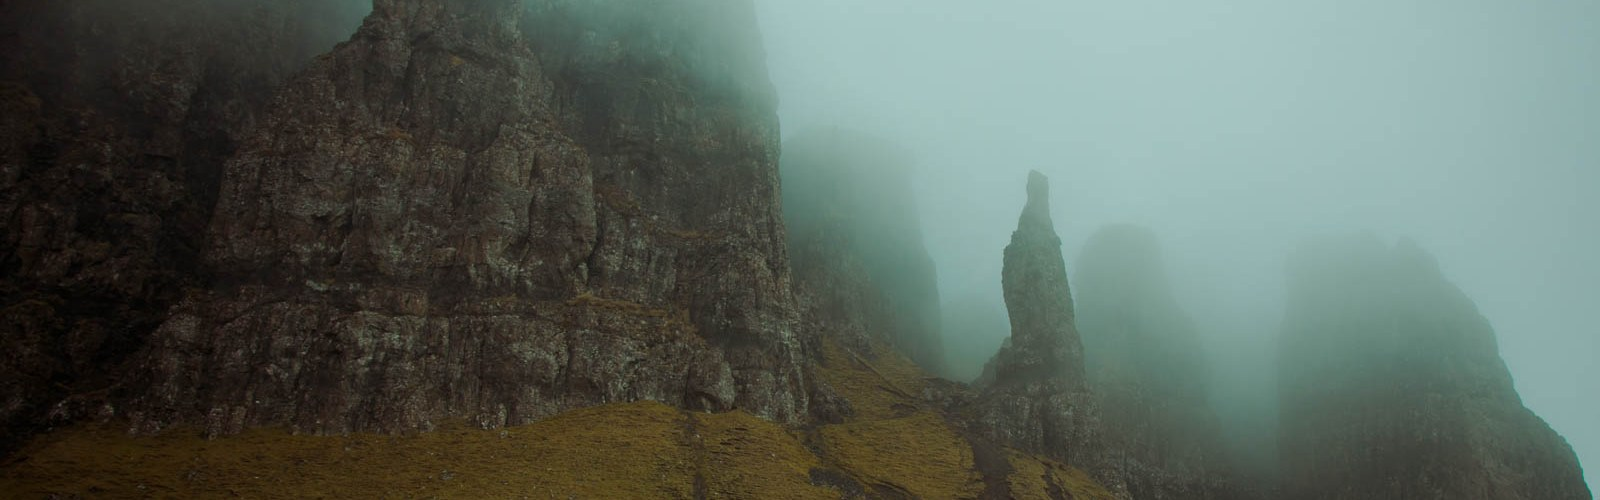 scotland-5233